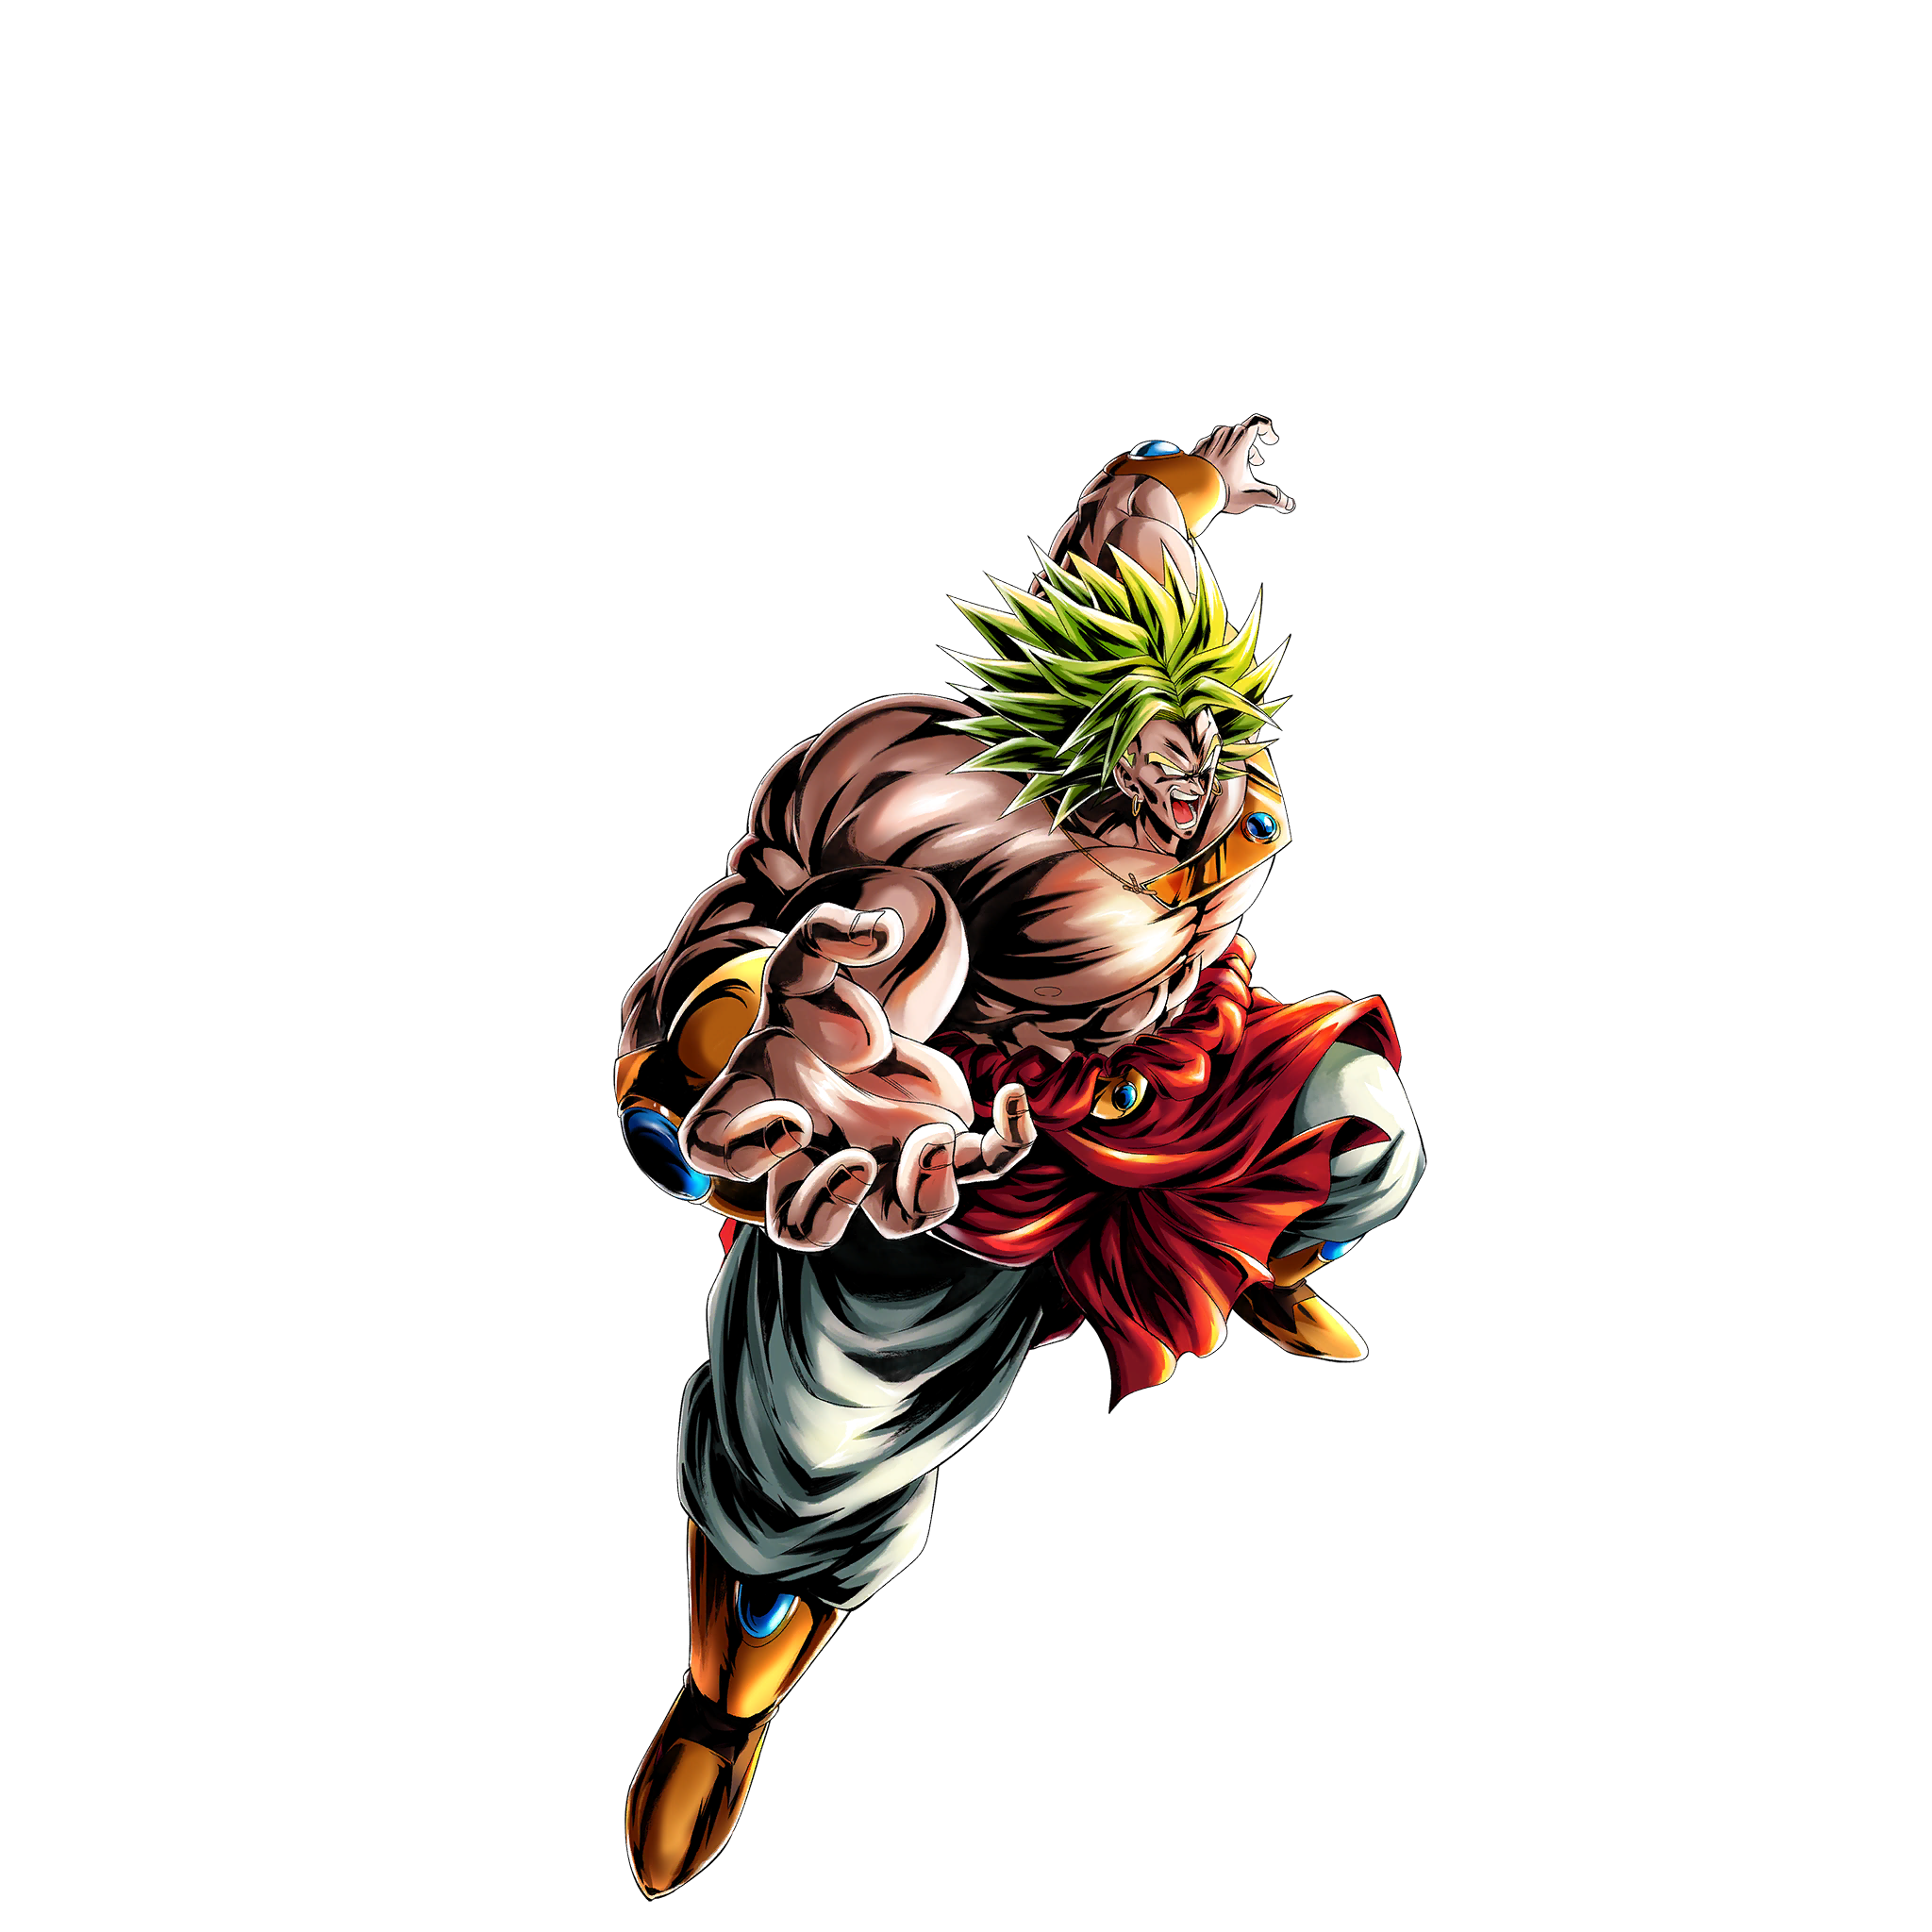 Broly Lssj Render Db Legends By Maxiuchiha22 On Deviantart Dragon Ball Artwork Dragon Ball Super Dragon Ball Z